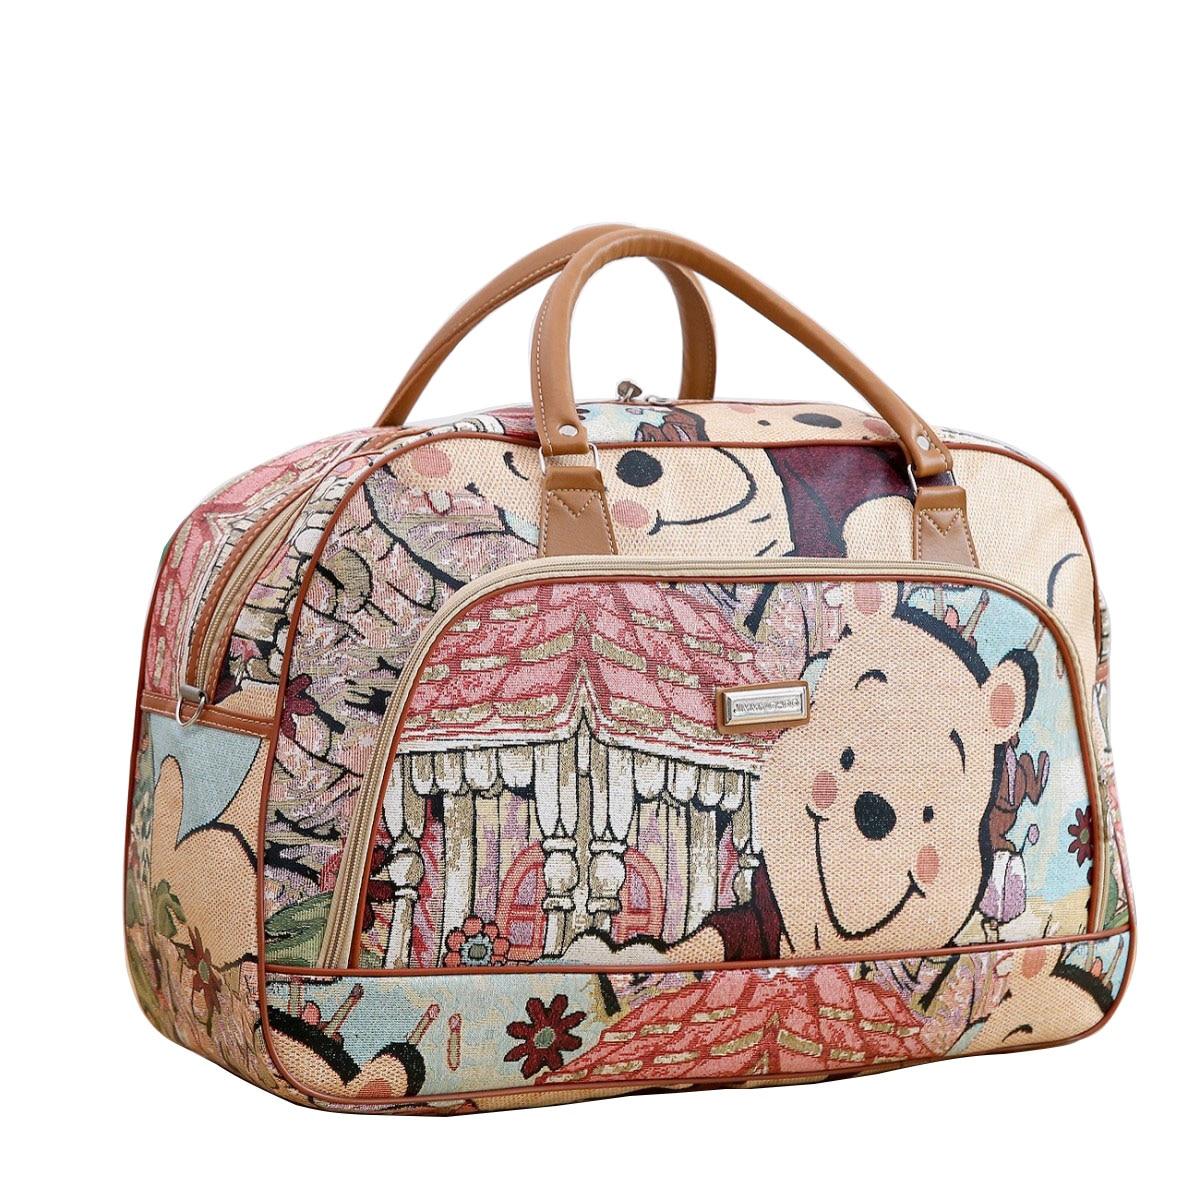 New Arrival Cartoon Travel Bag Children Hand Luggage Bag Waterproof PU Leather Travel Bag Duffle Bag Vintage Handbags